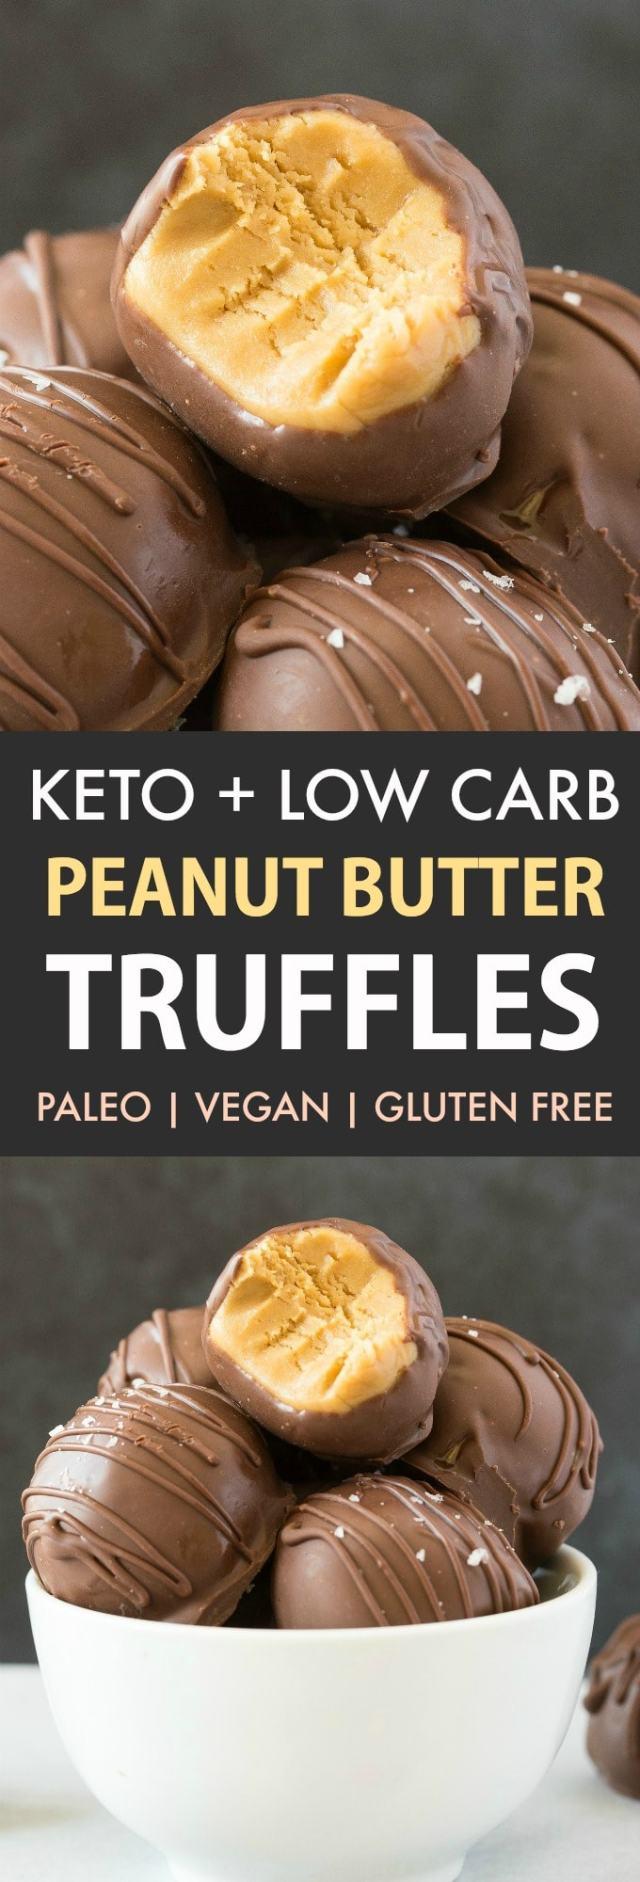 Keto Chocolate Peanut Butter Truffles in a white bowl.